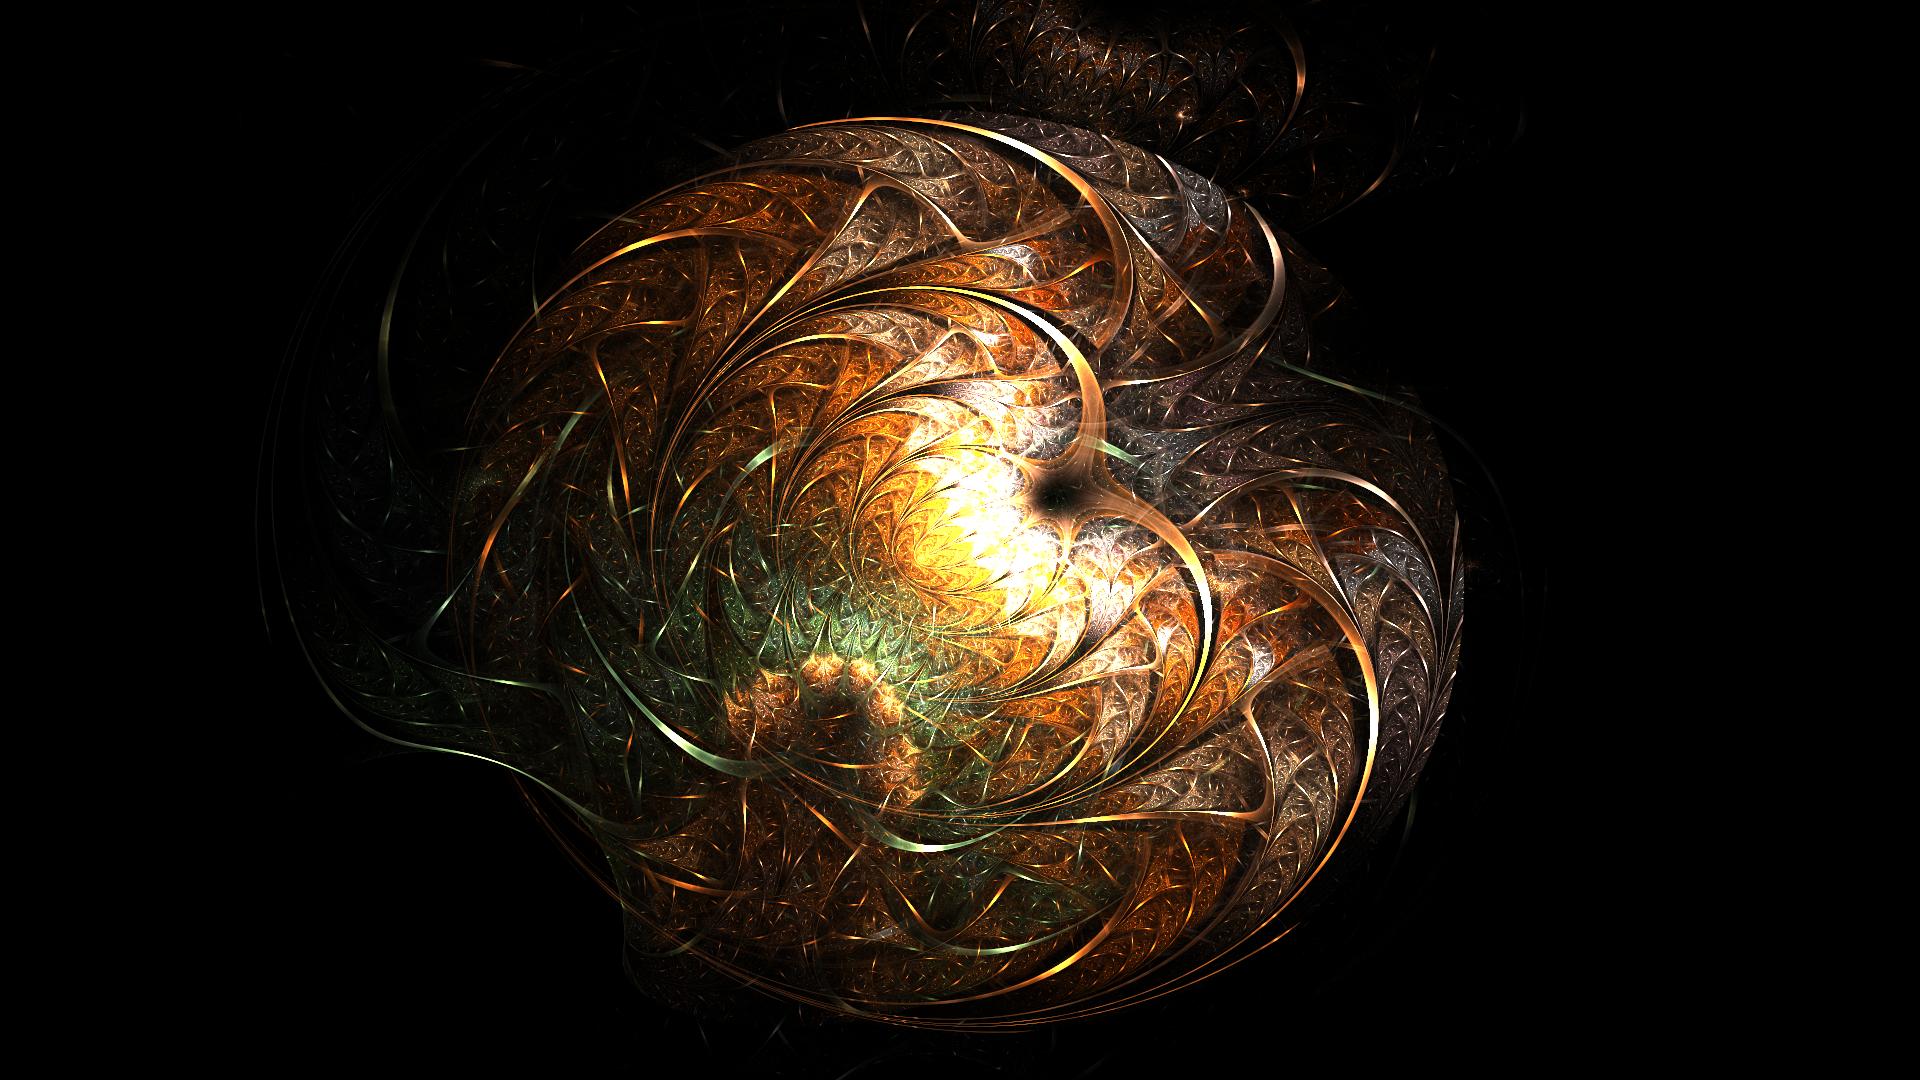 Chaotica III by Fractamonium